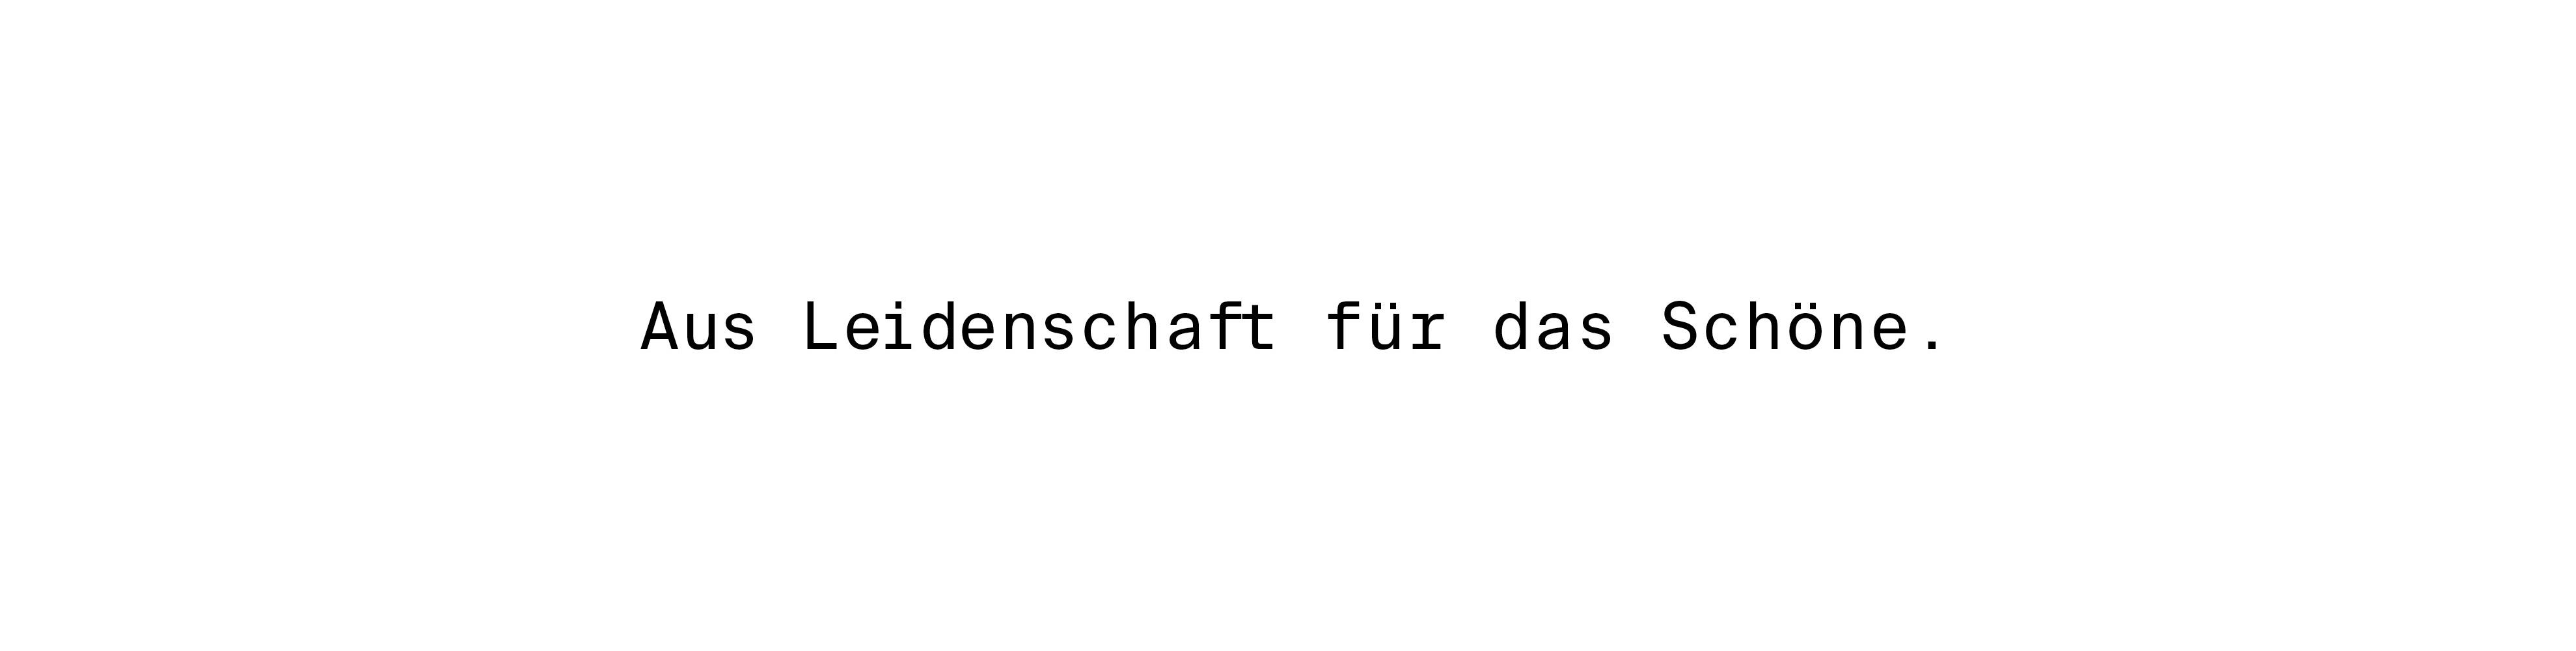 Fuchs_Endfolie3